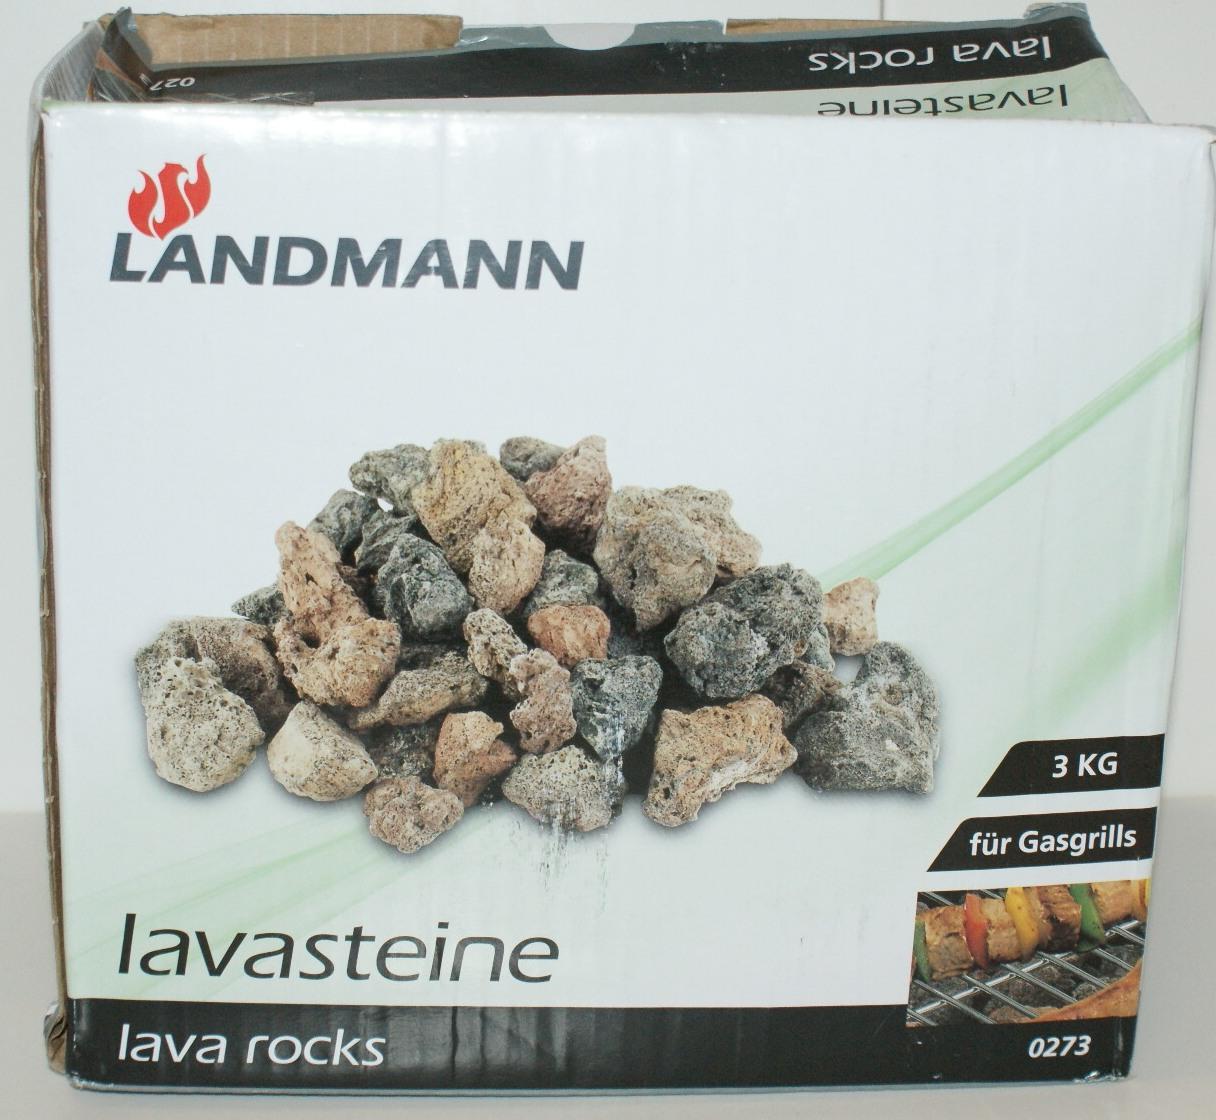 landmann lavasteine 3kg f r gasgrill 0273 4 33euro kg. Black Bedroom Furniture Sets. Home Design Ideas